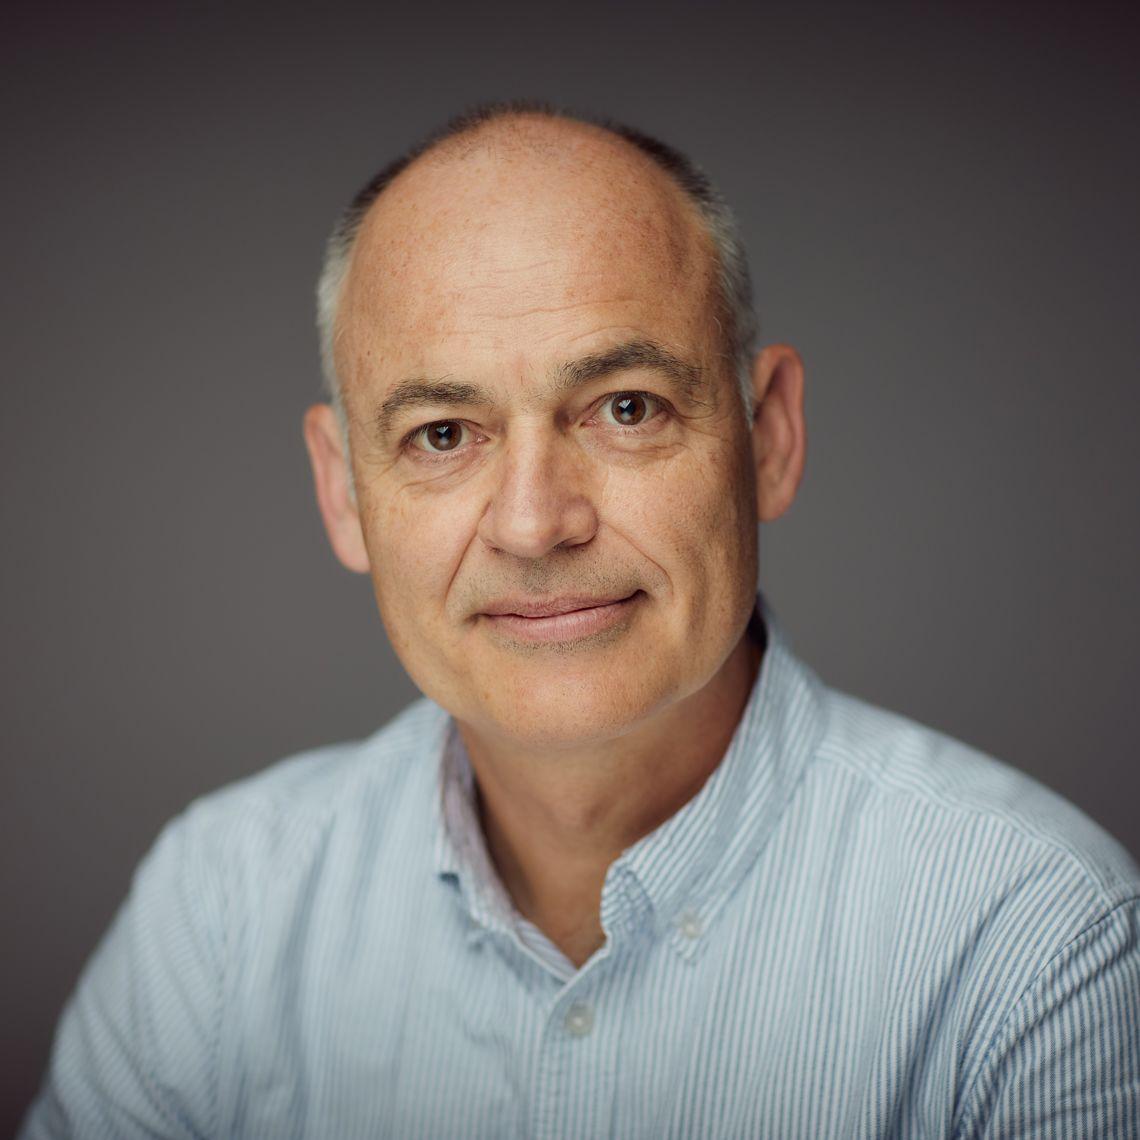 Professor Mike English